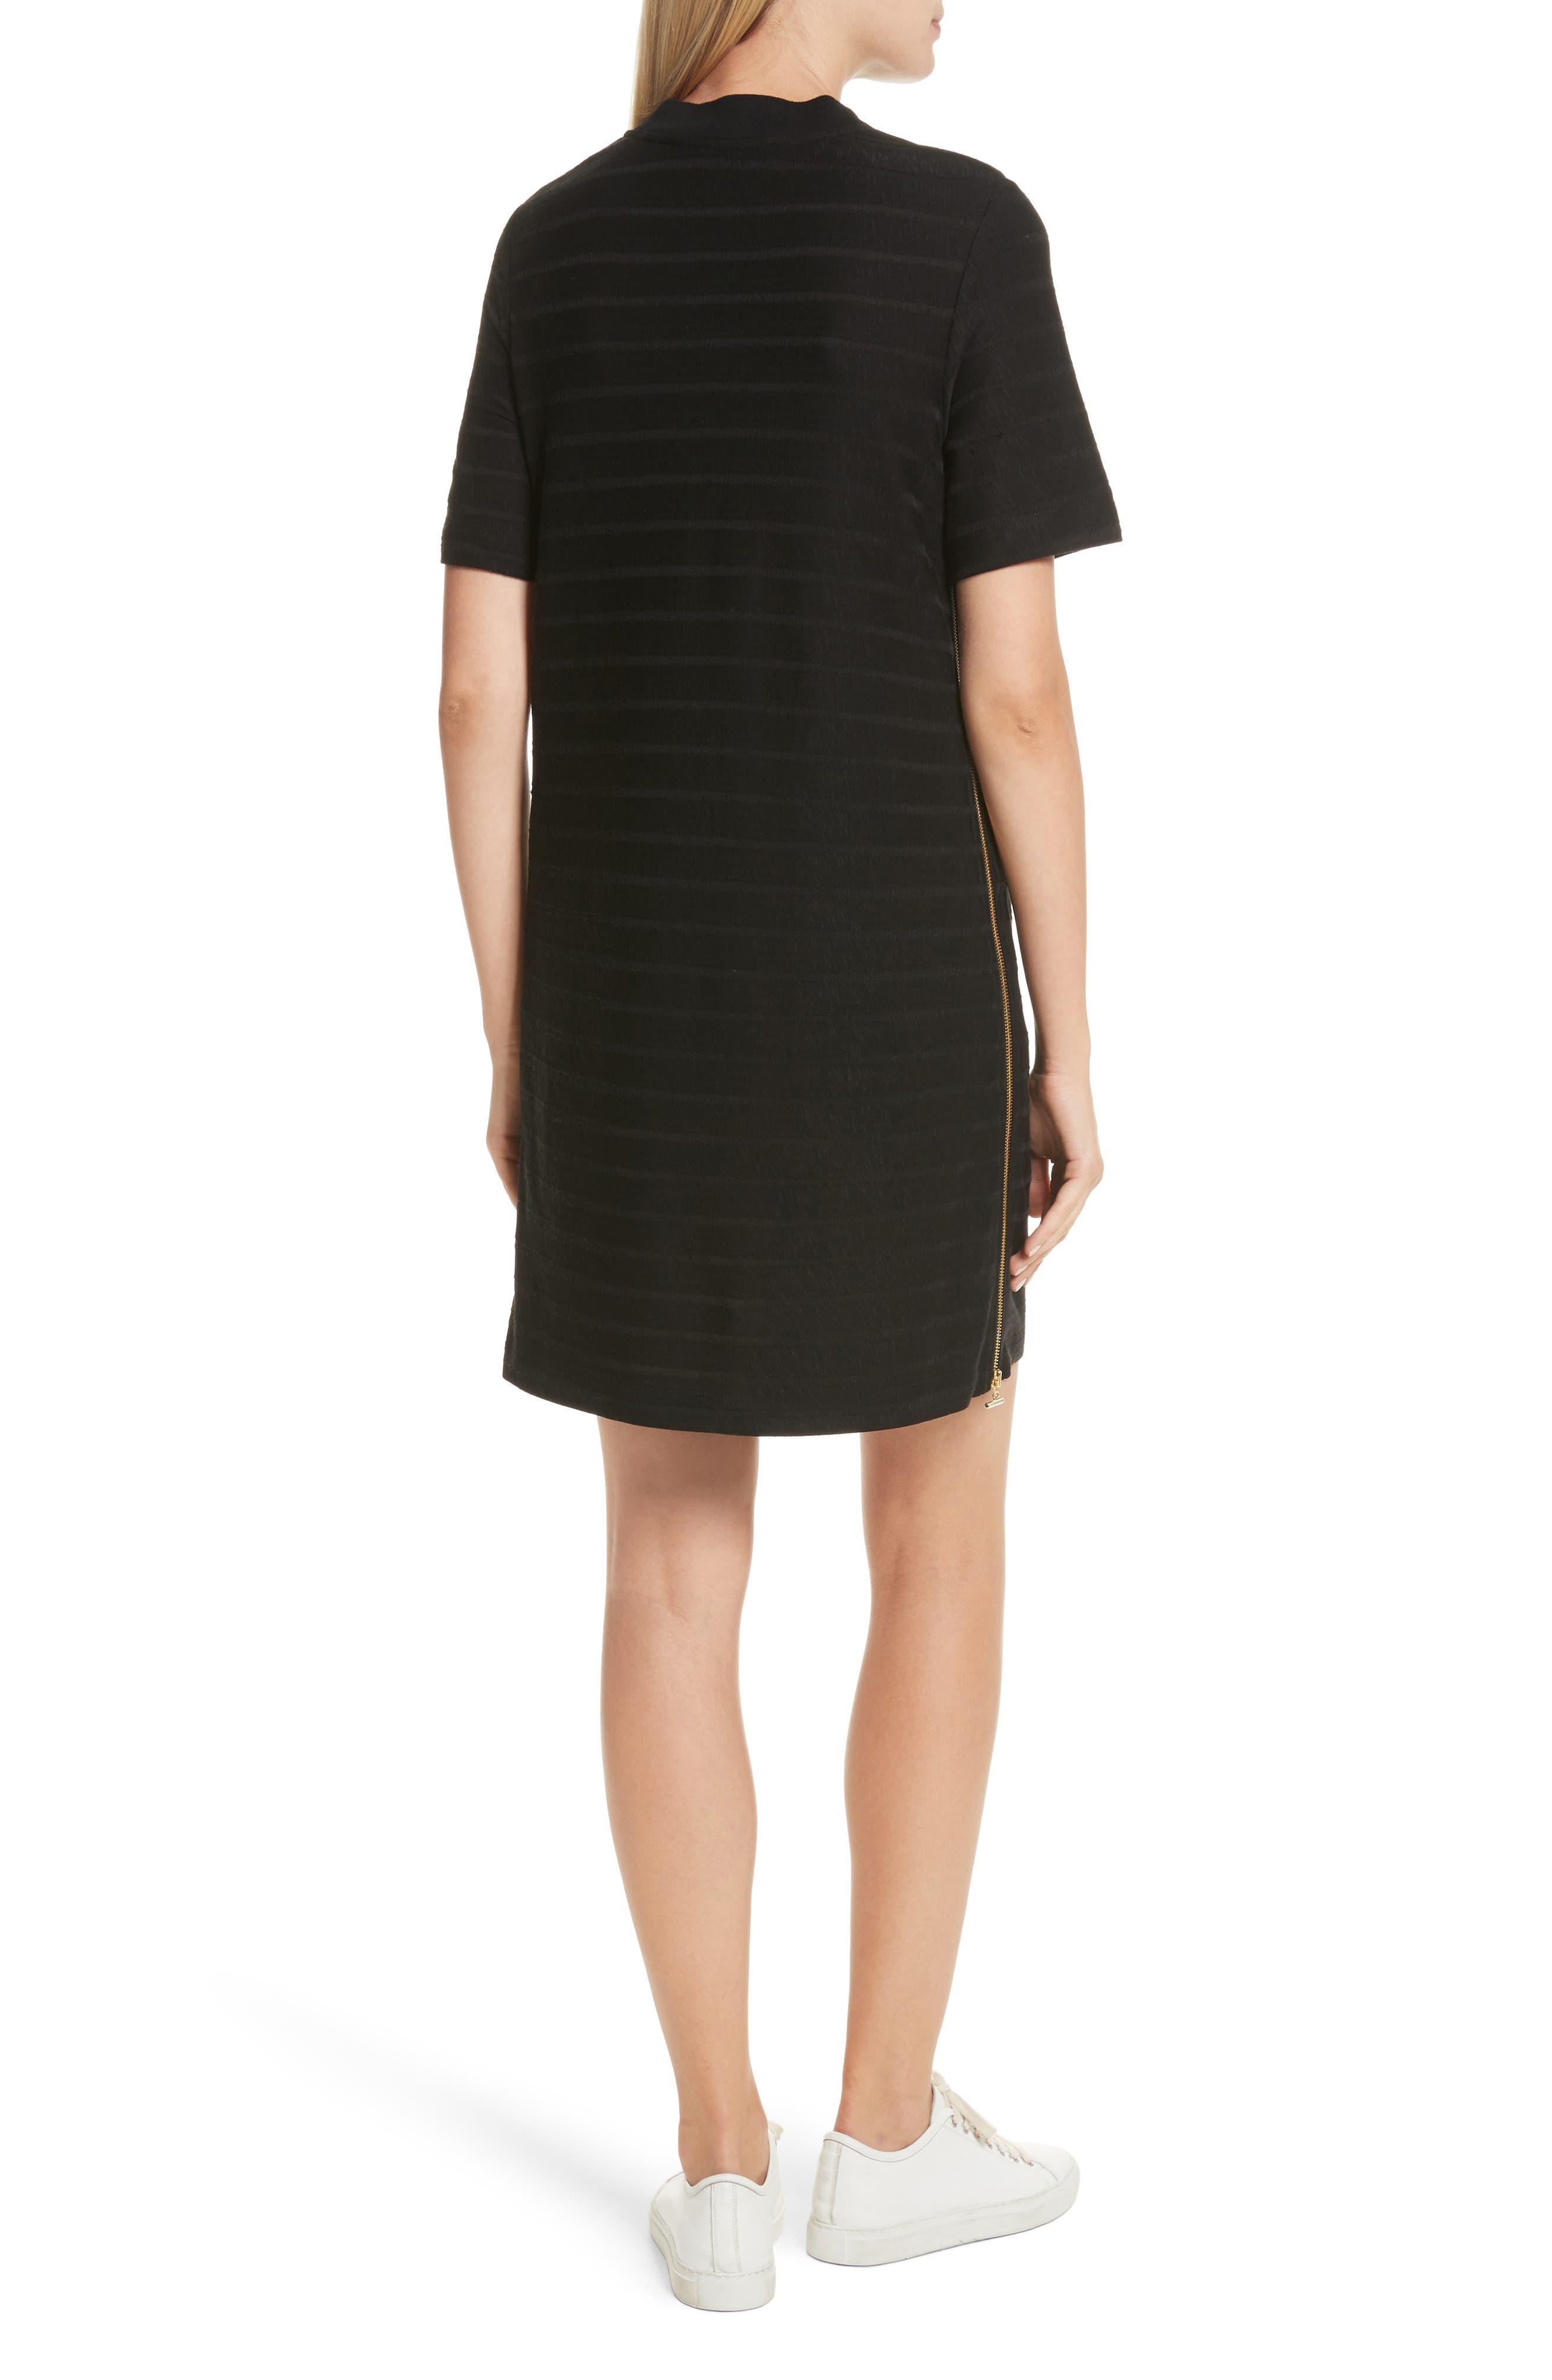 Alternate Image 2  - Derek Lam 10 Crosby T-Shirt Dress